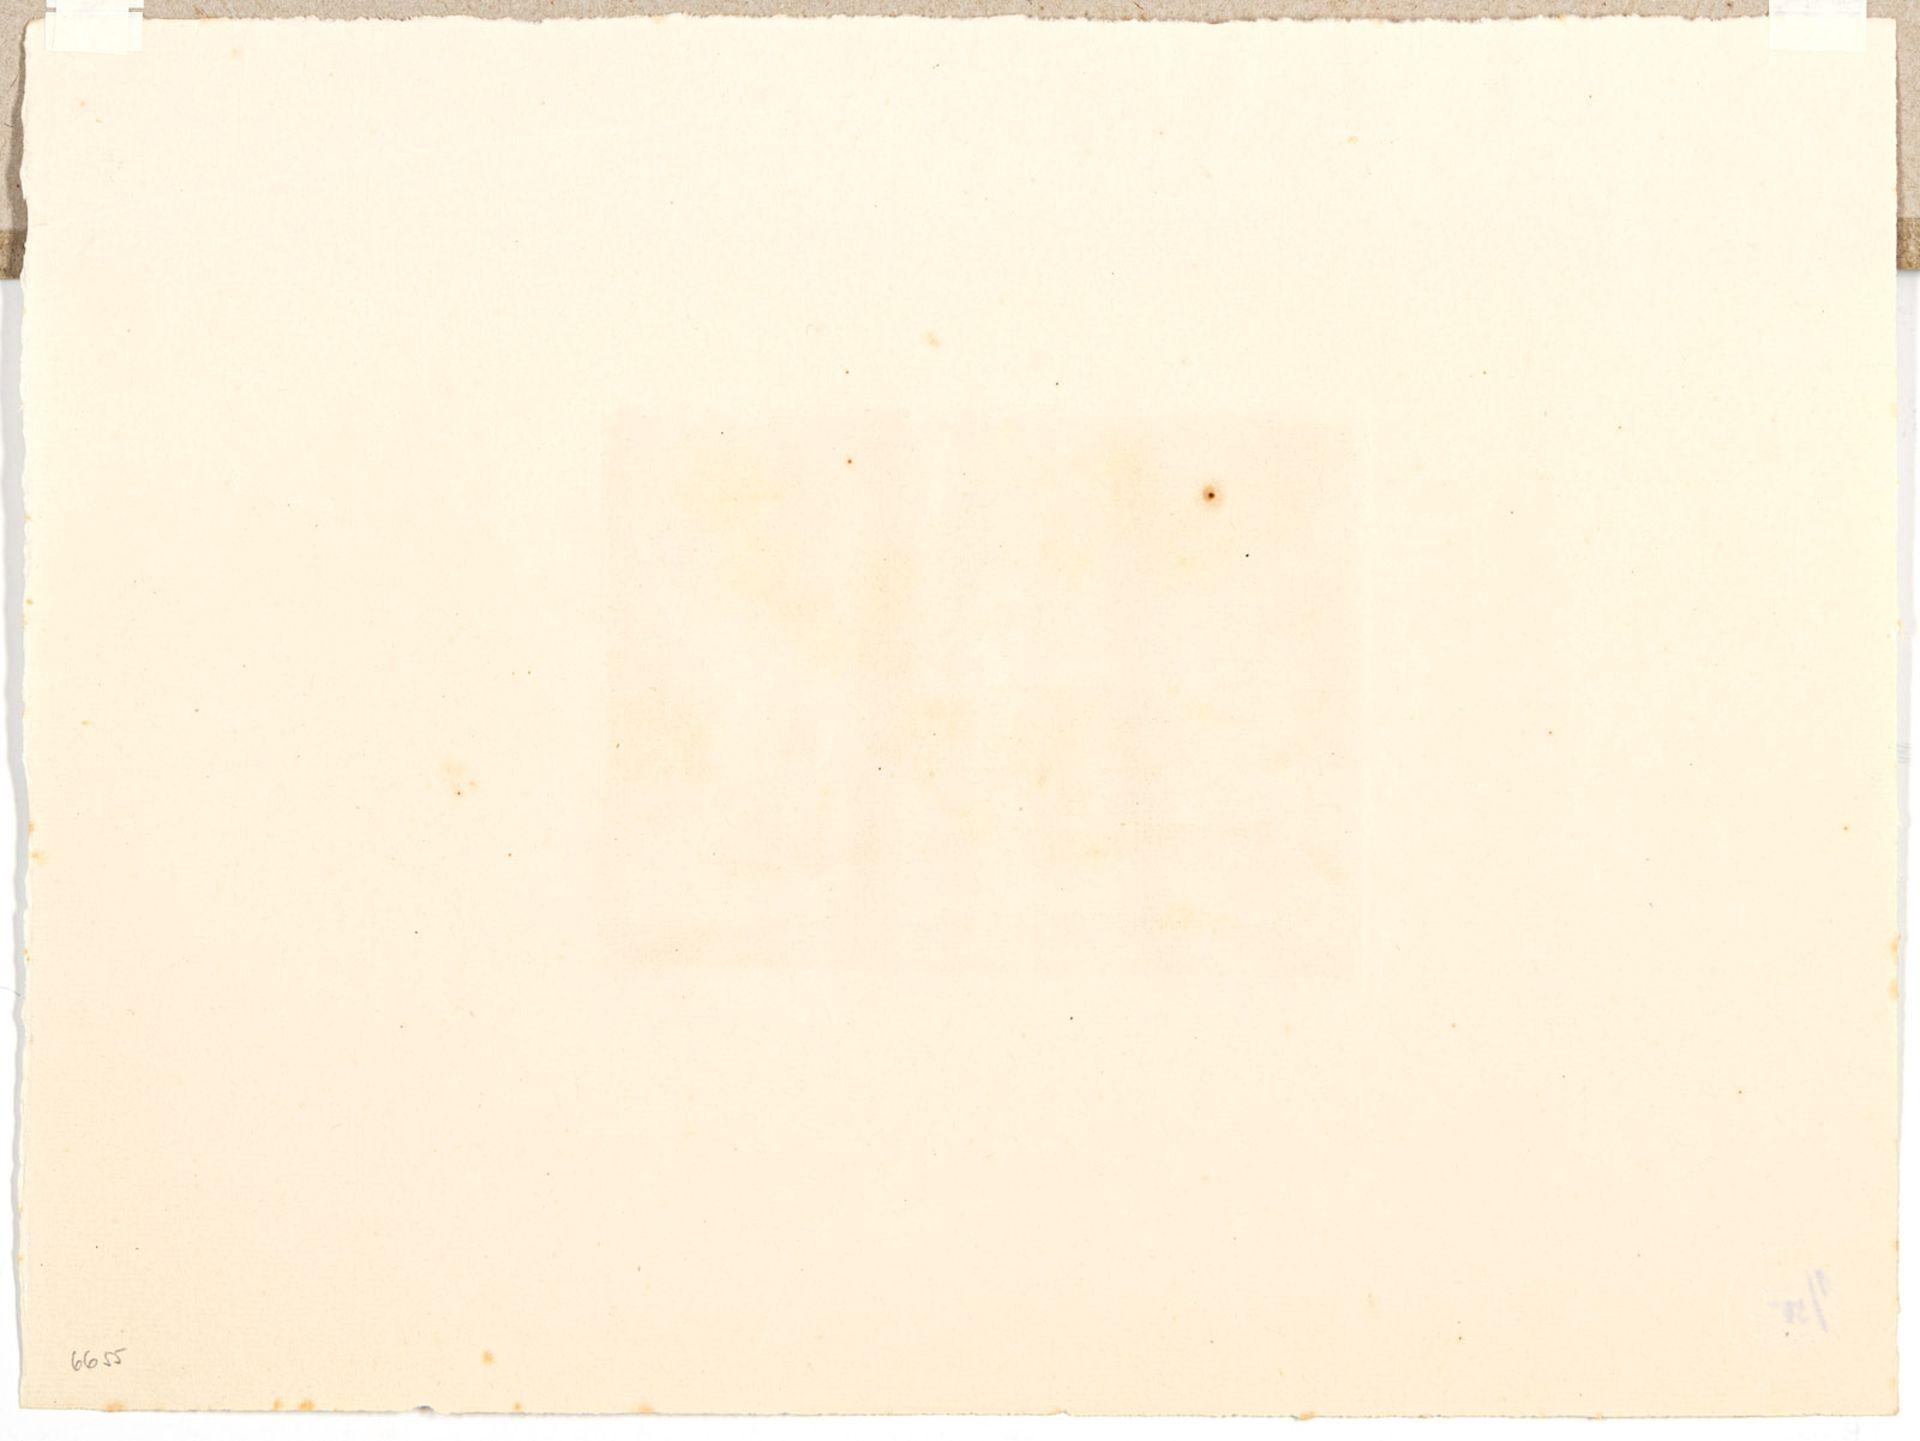 Purrmann, Hans - Image 4 of 4